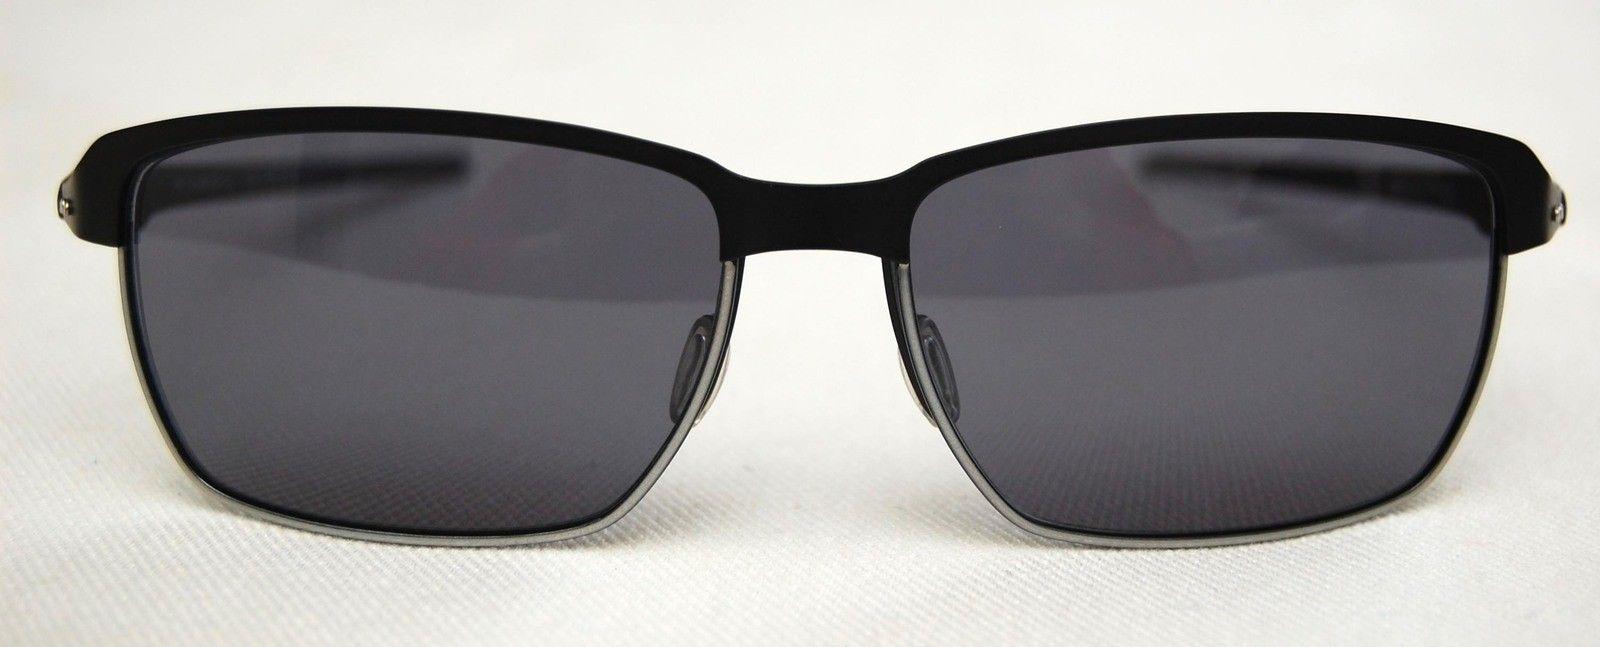 Tinfoil Carbon OO6018-01 Matte Black / Silver | Grey Lens - 03.jpg